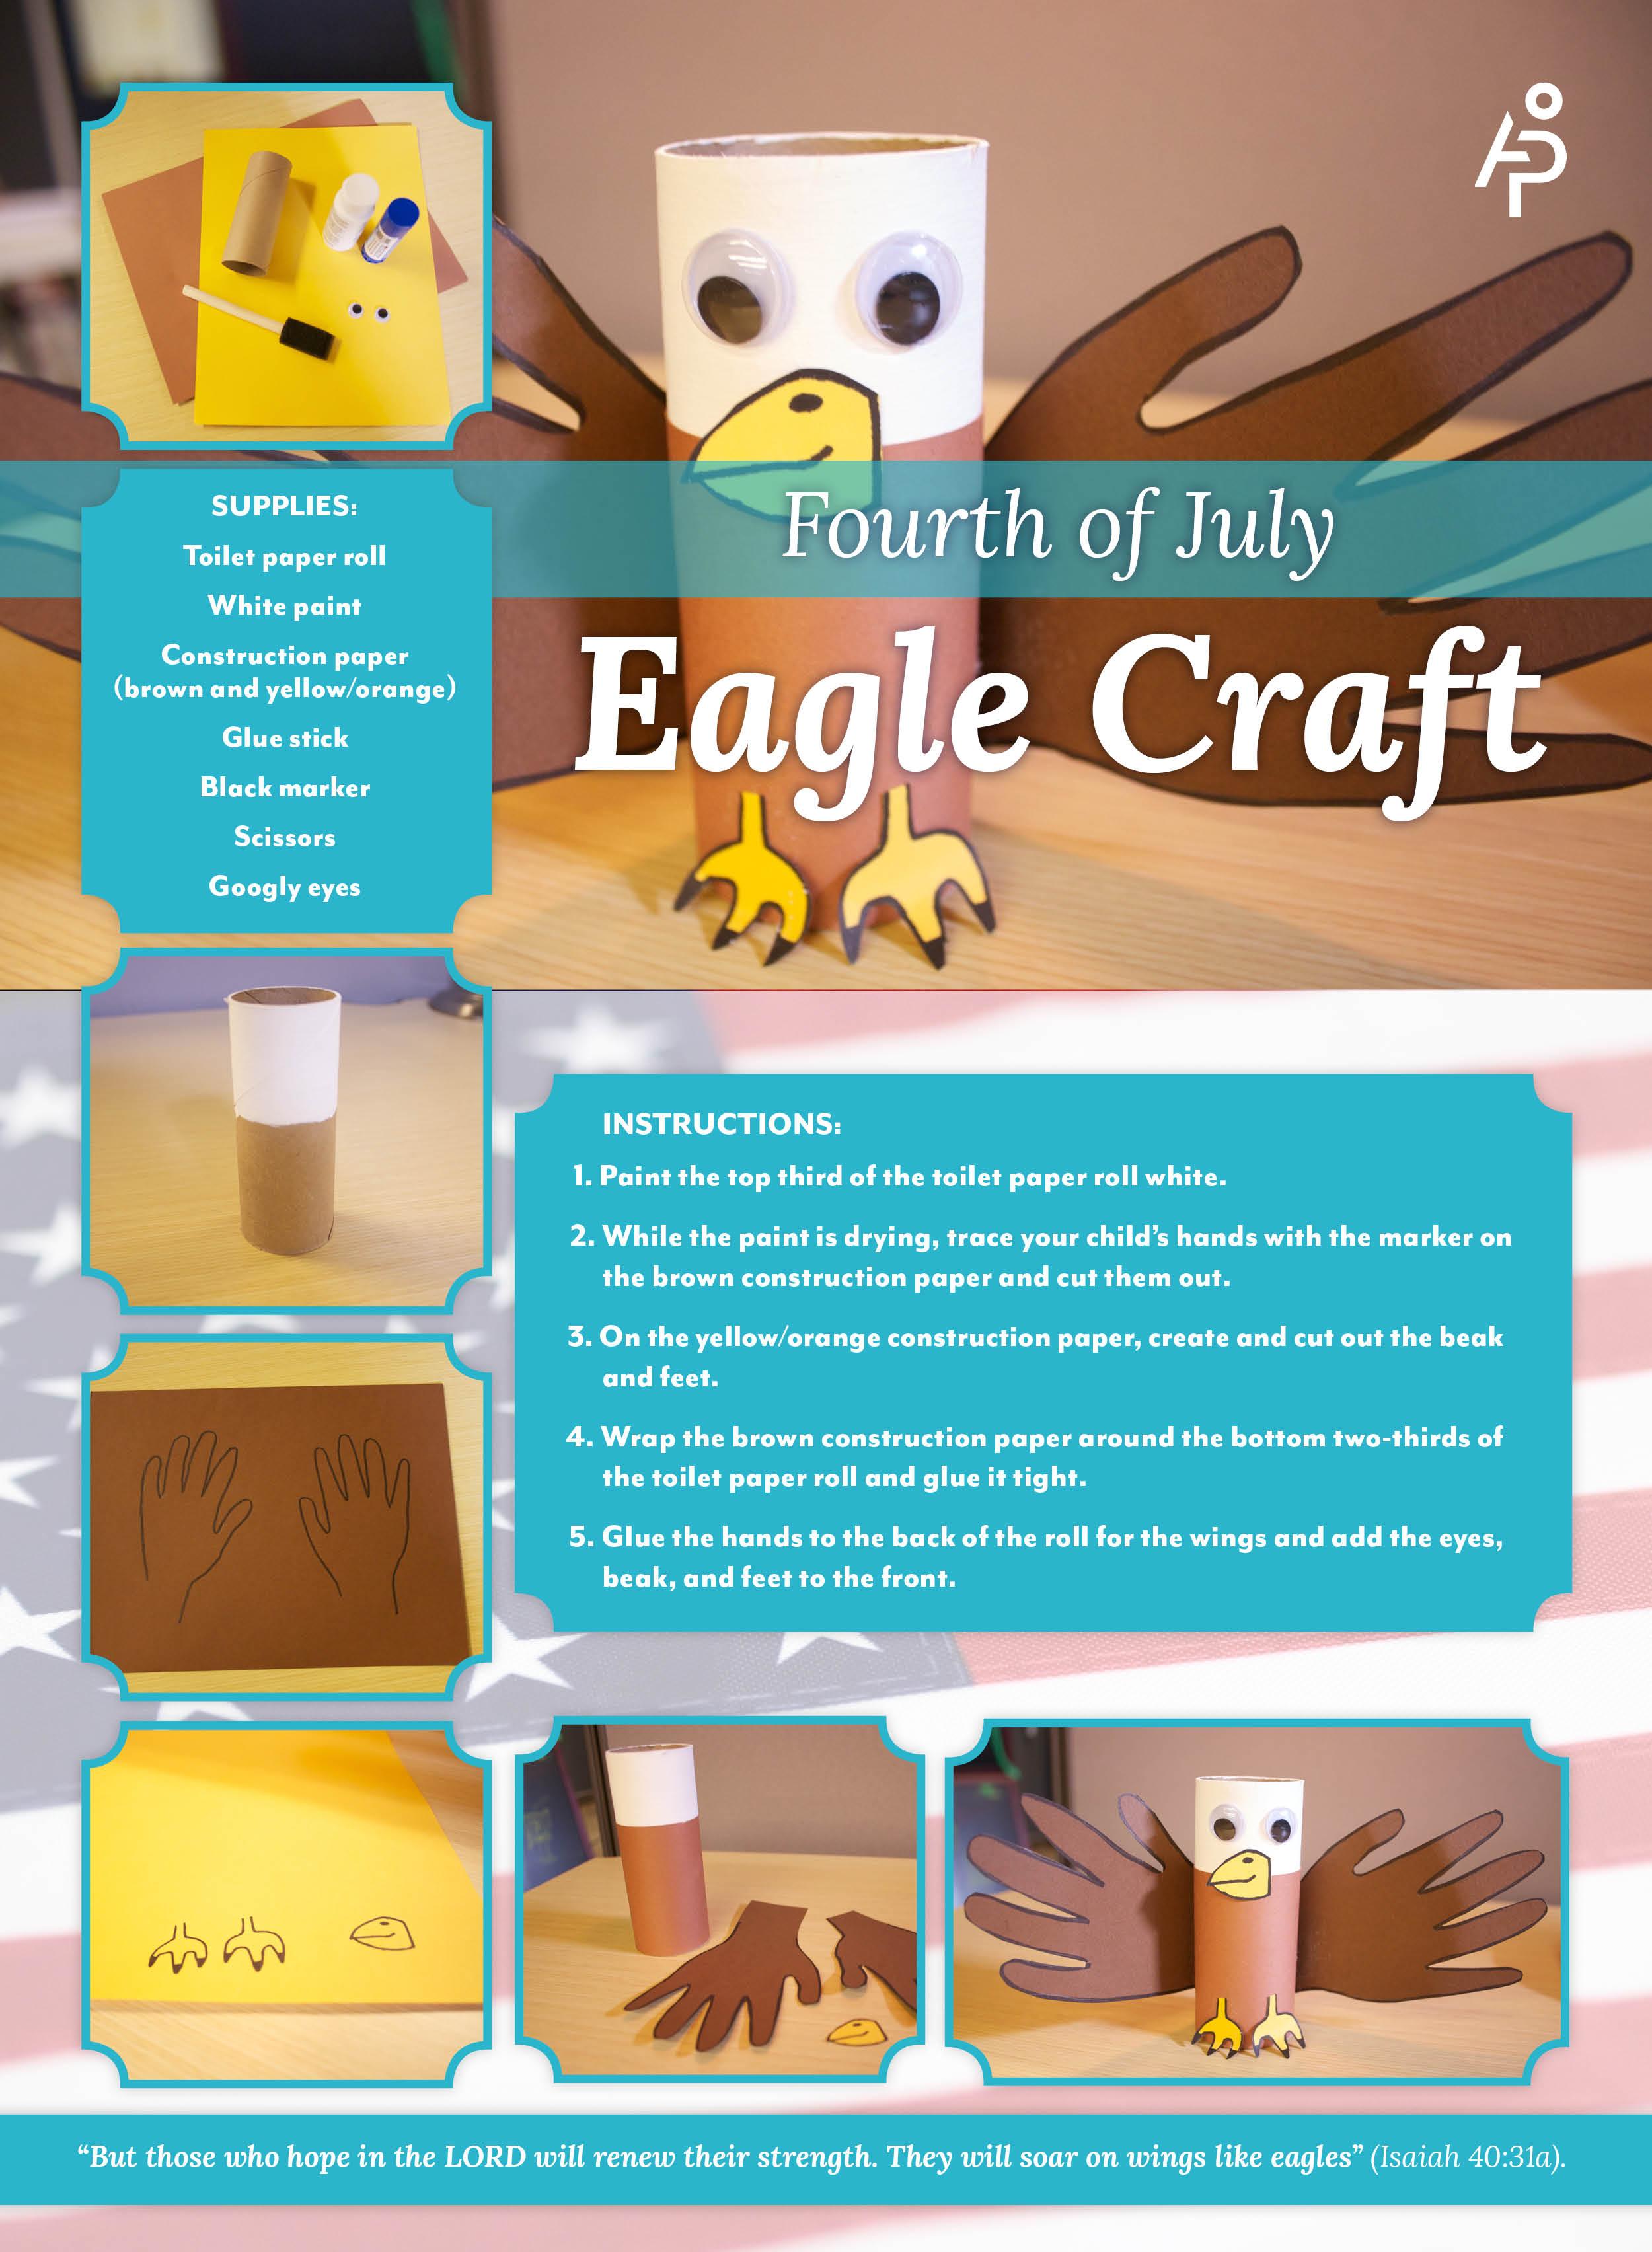 Fourth of July Eagle Craft